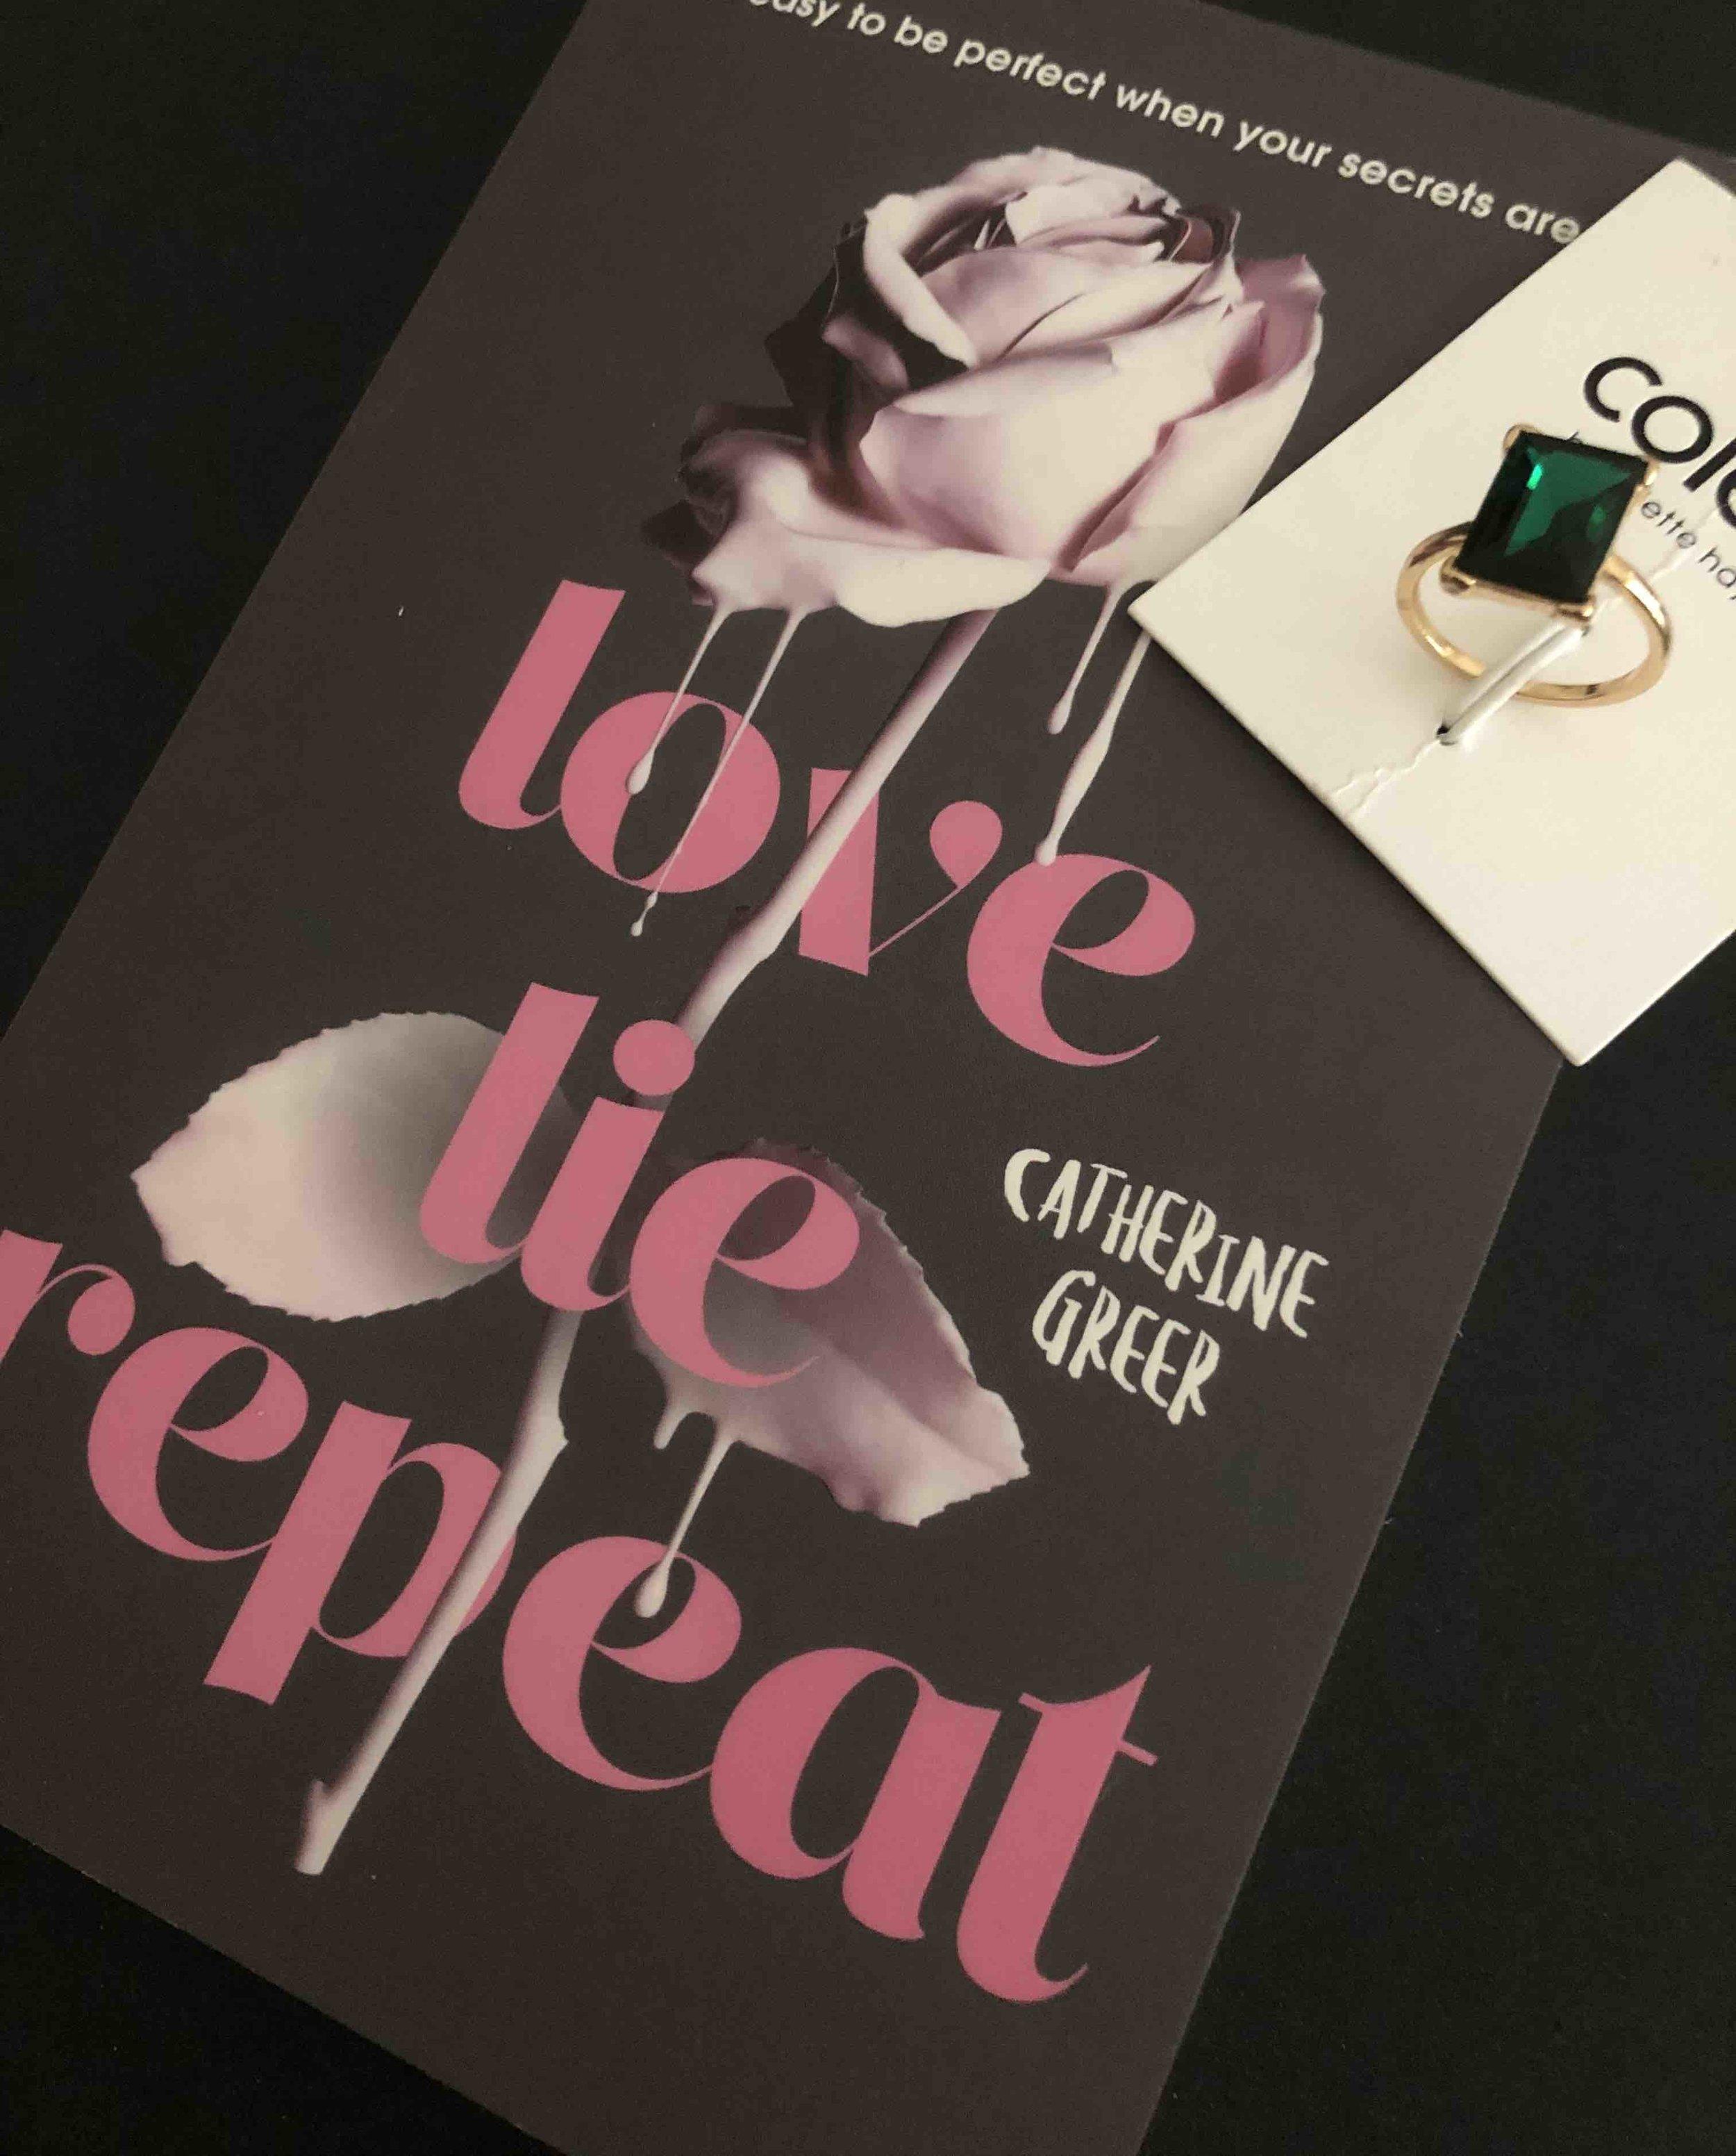 Love Lie Repeat emerald.jpg